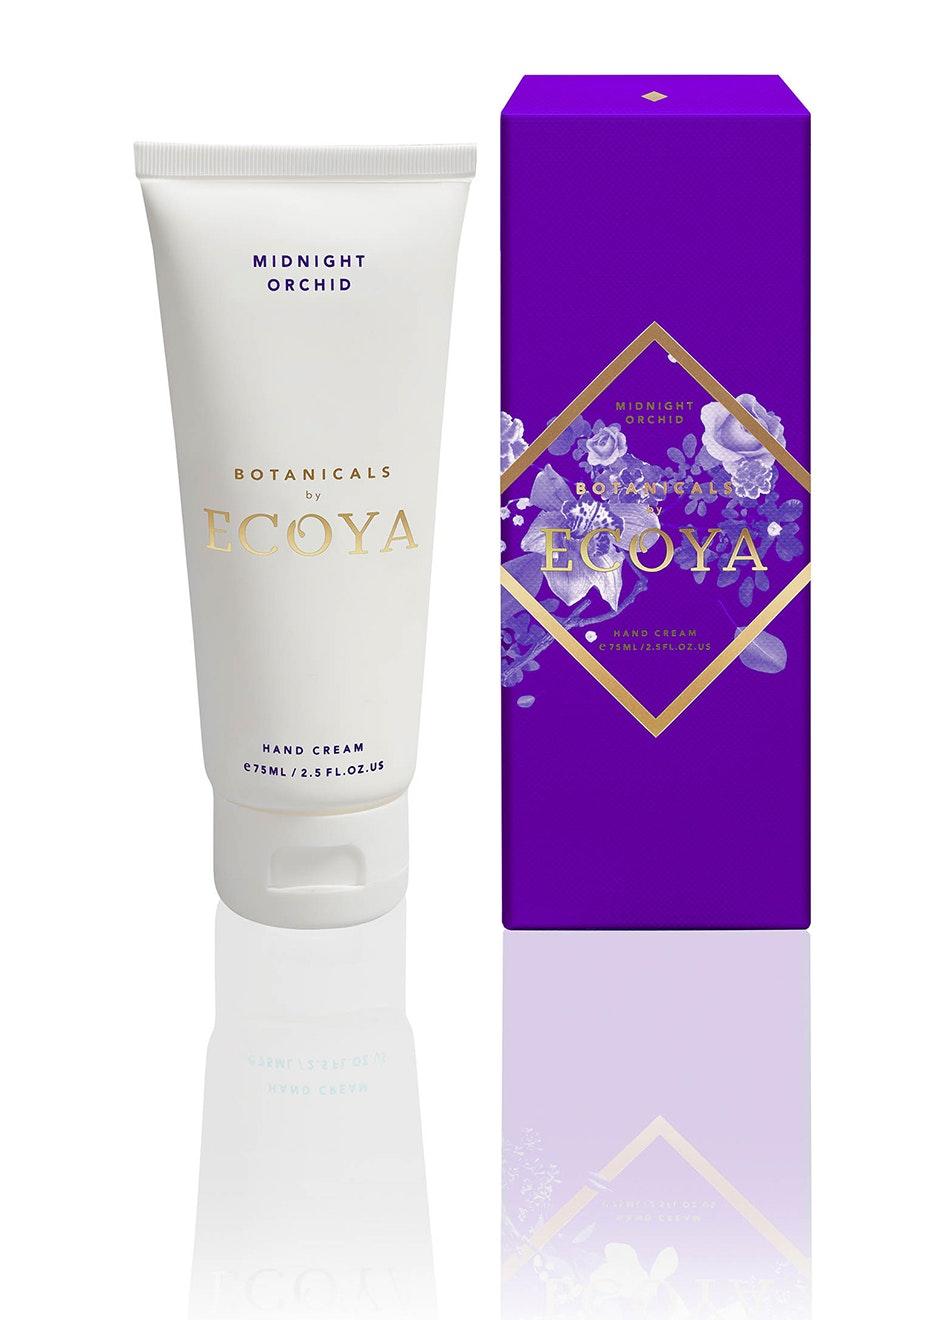 Ecoya - Hand Cream - Midnight Orchid